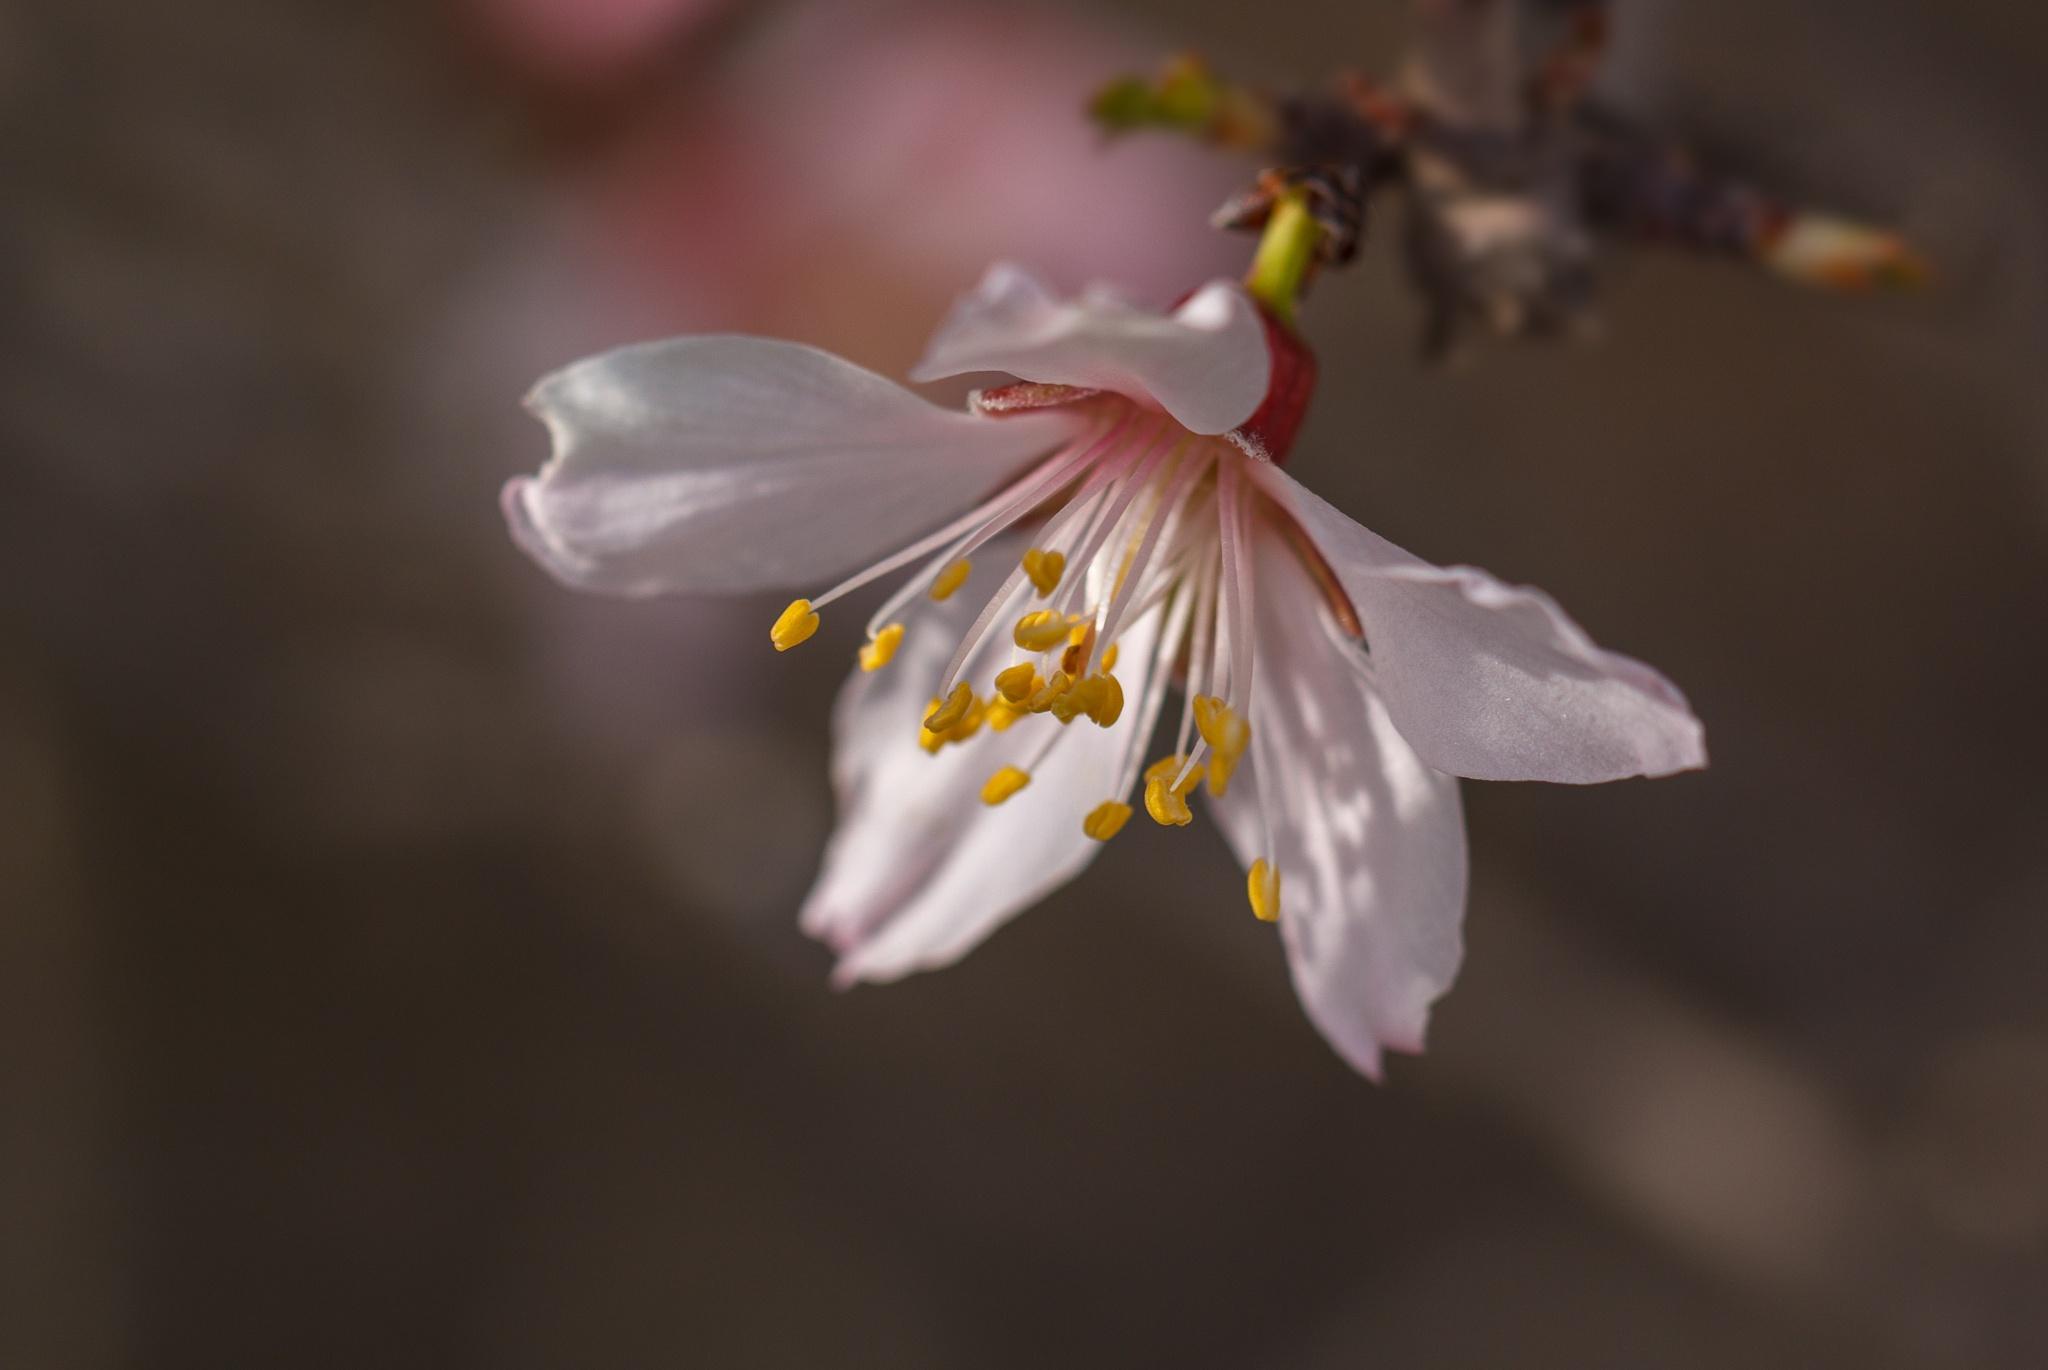 Almond Blossom by ALSMADI AHMAD